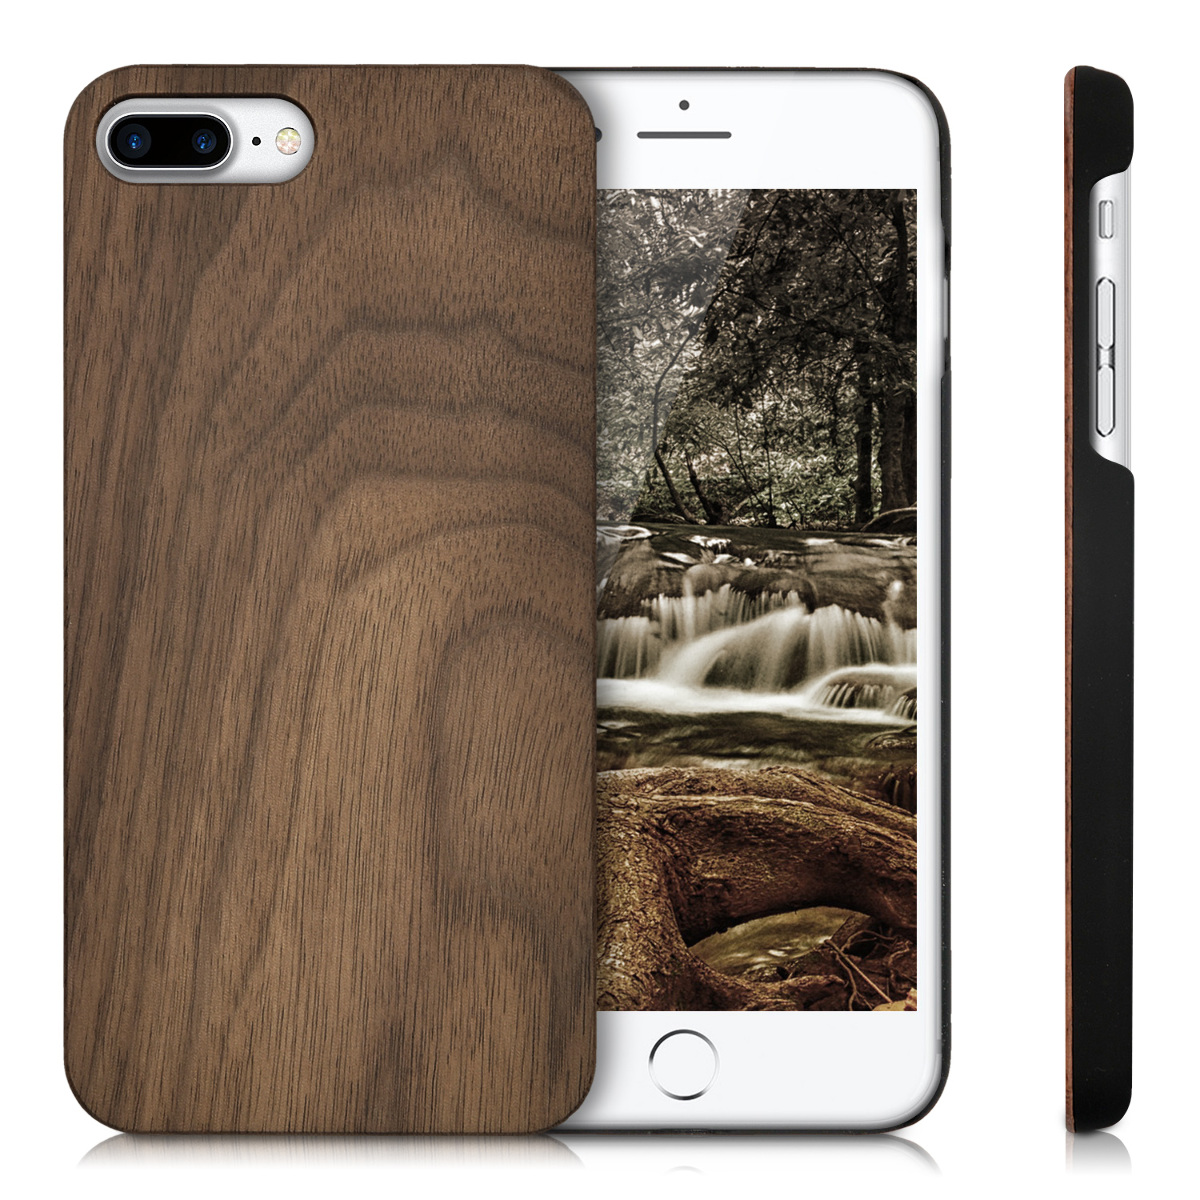 kwmobile holz h lle f r apple iphone 7 plus schutzh lle. Black Bedroom Furniture Sets. Home Design Ideas